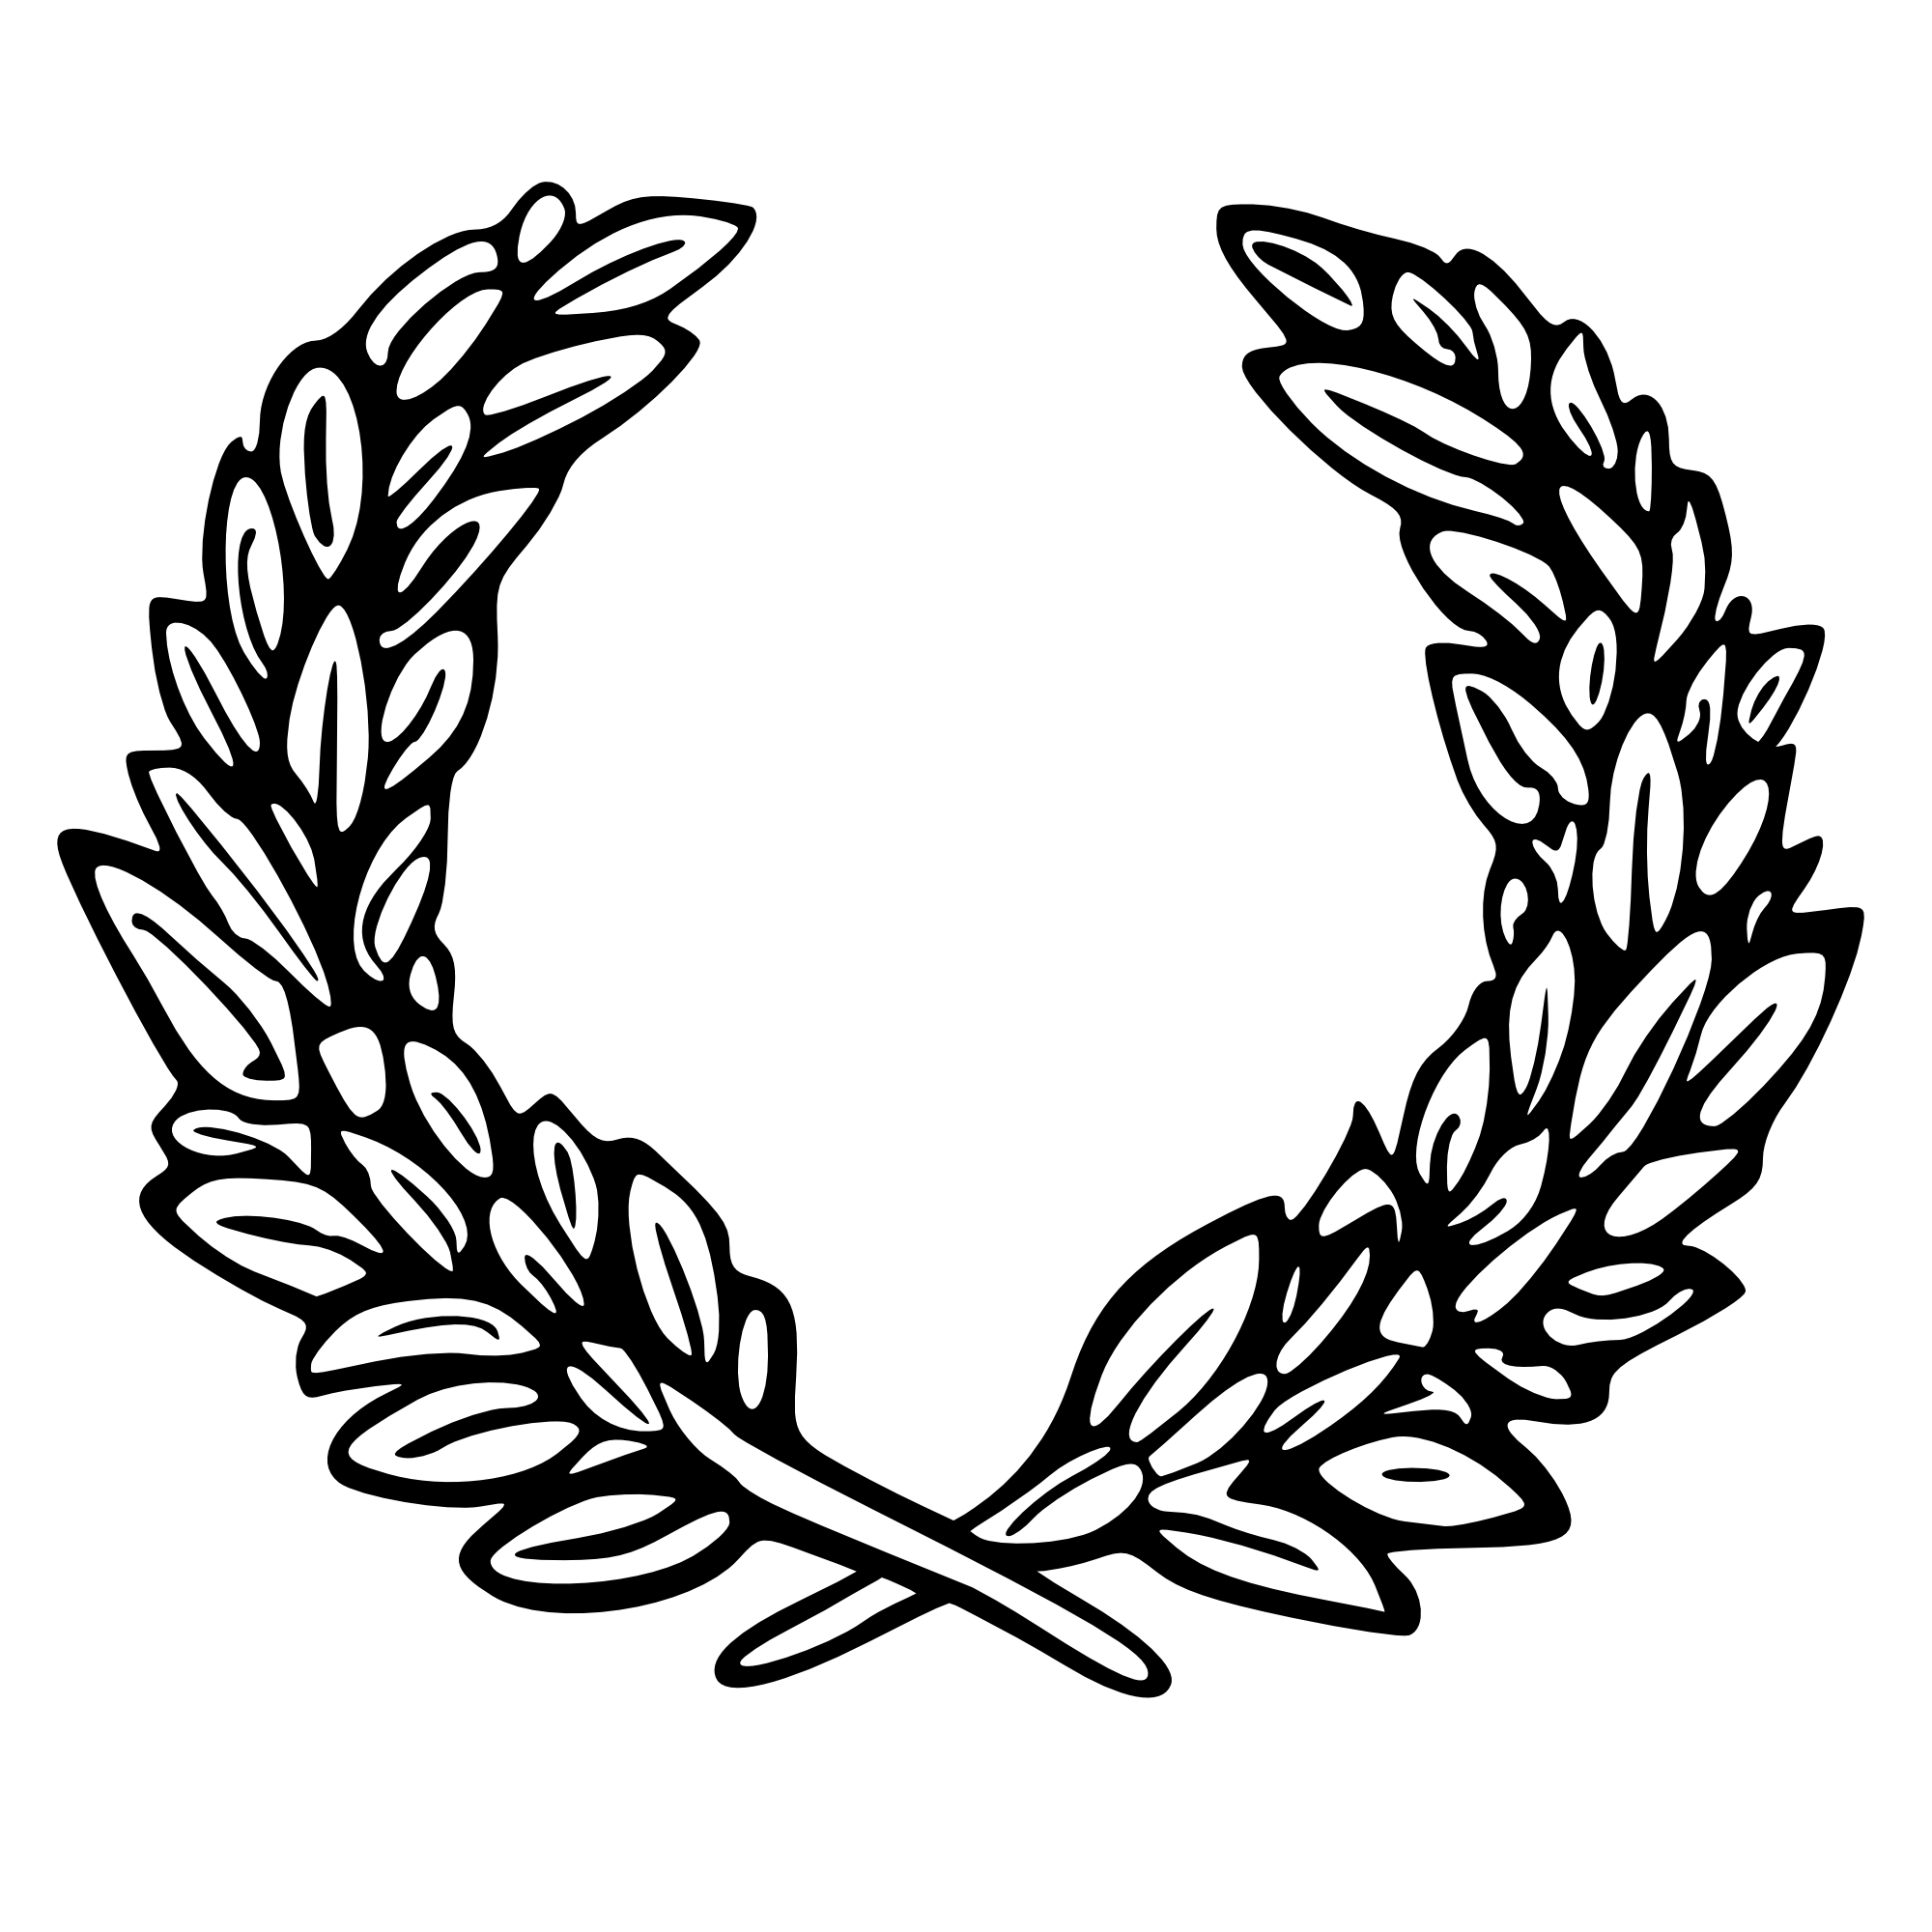 Tattoo Laurel Wreath Desain Png